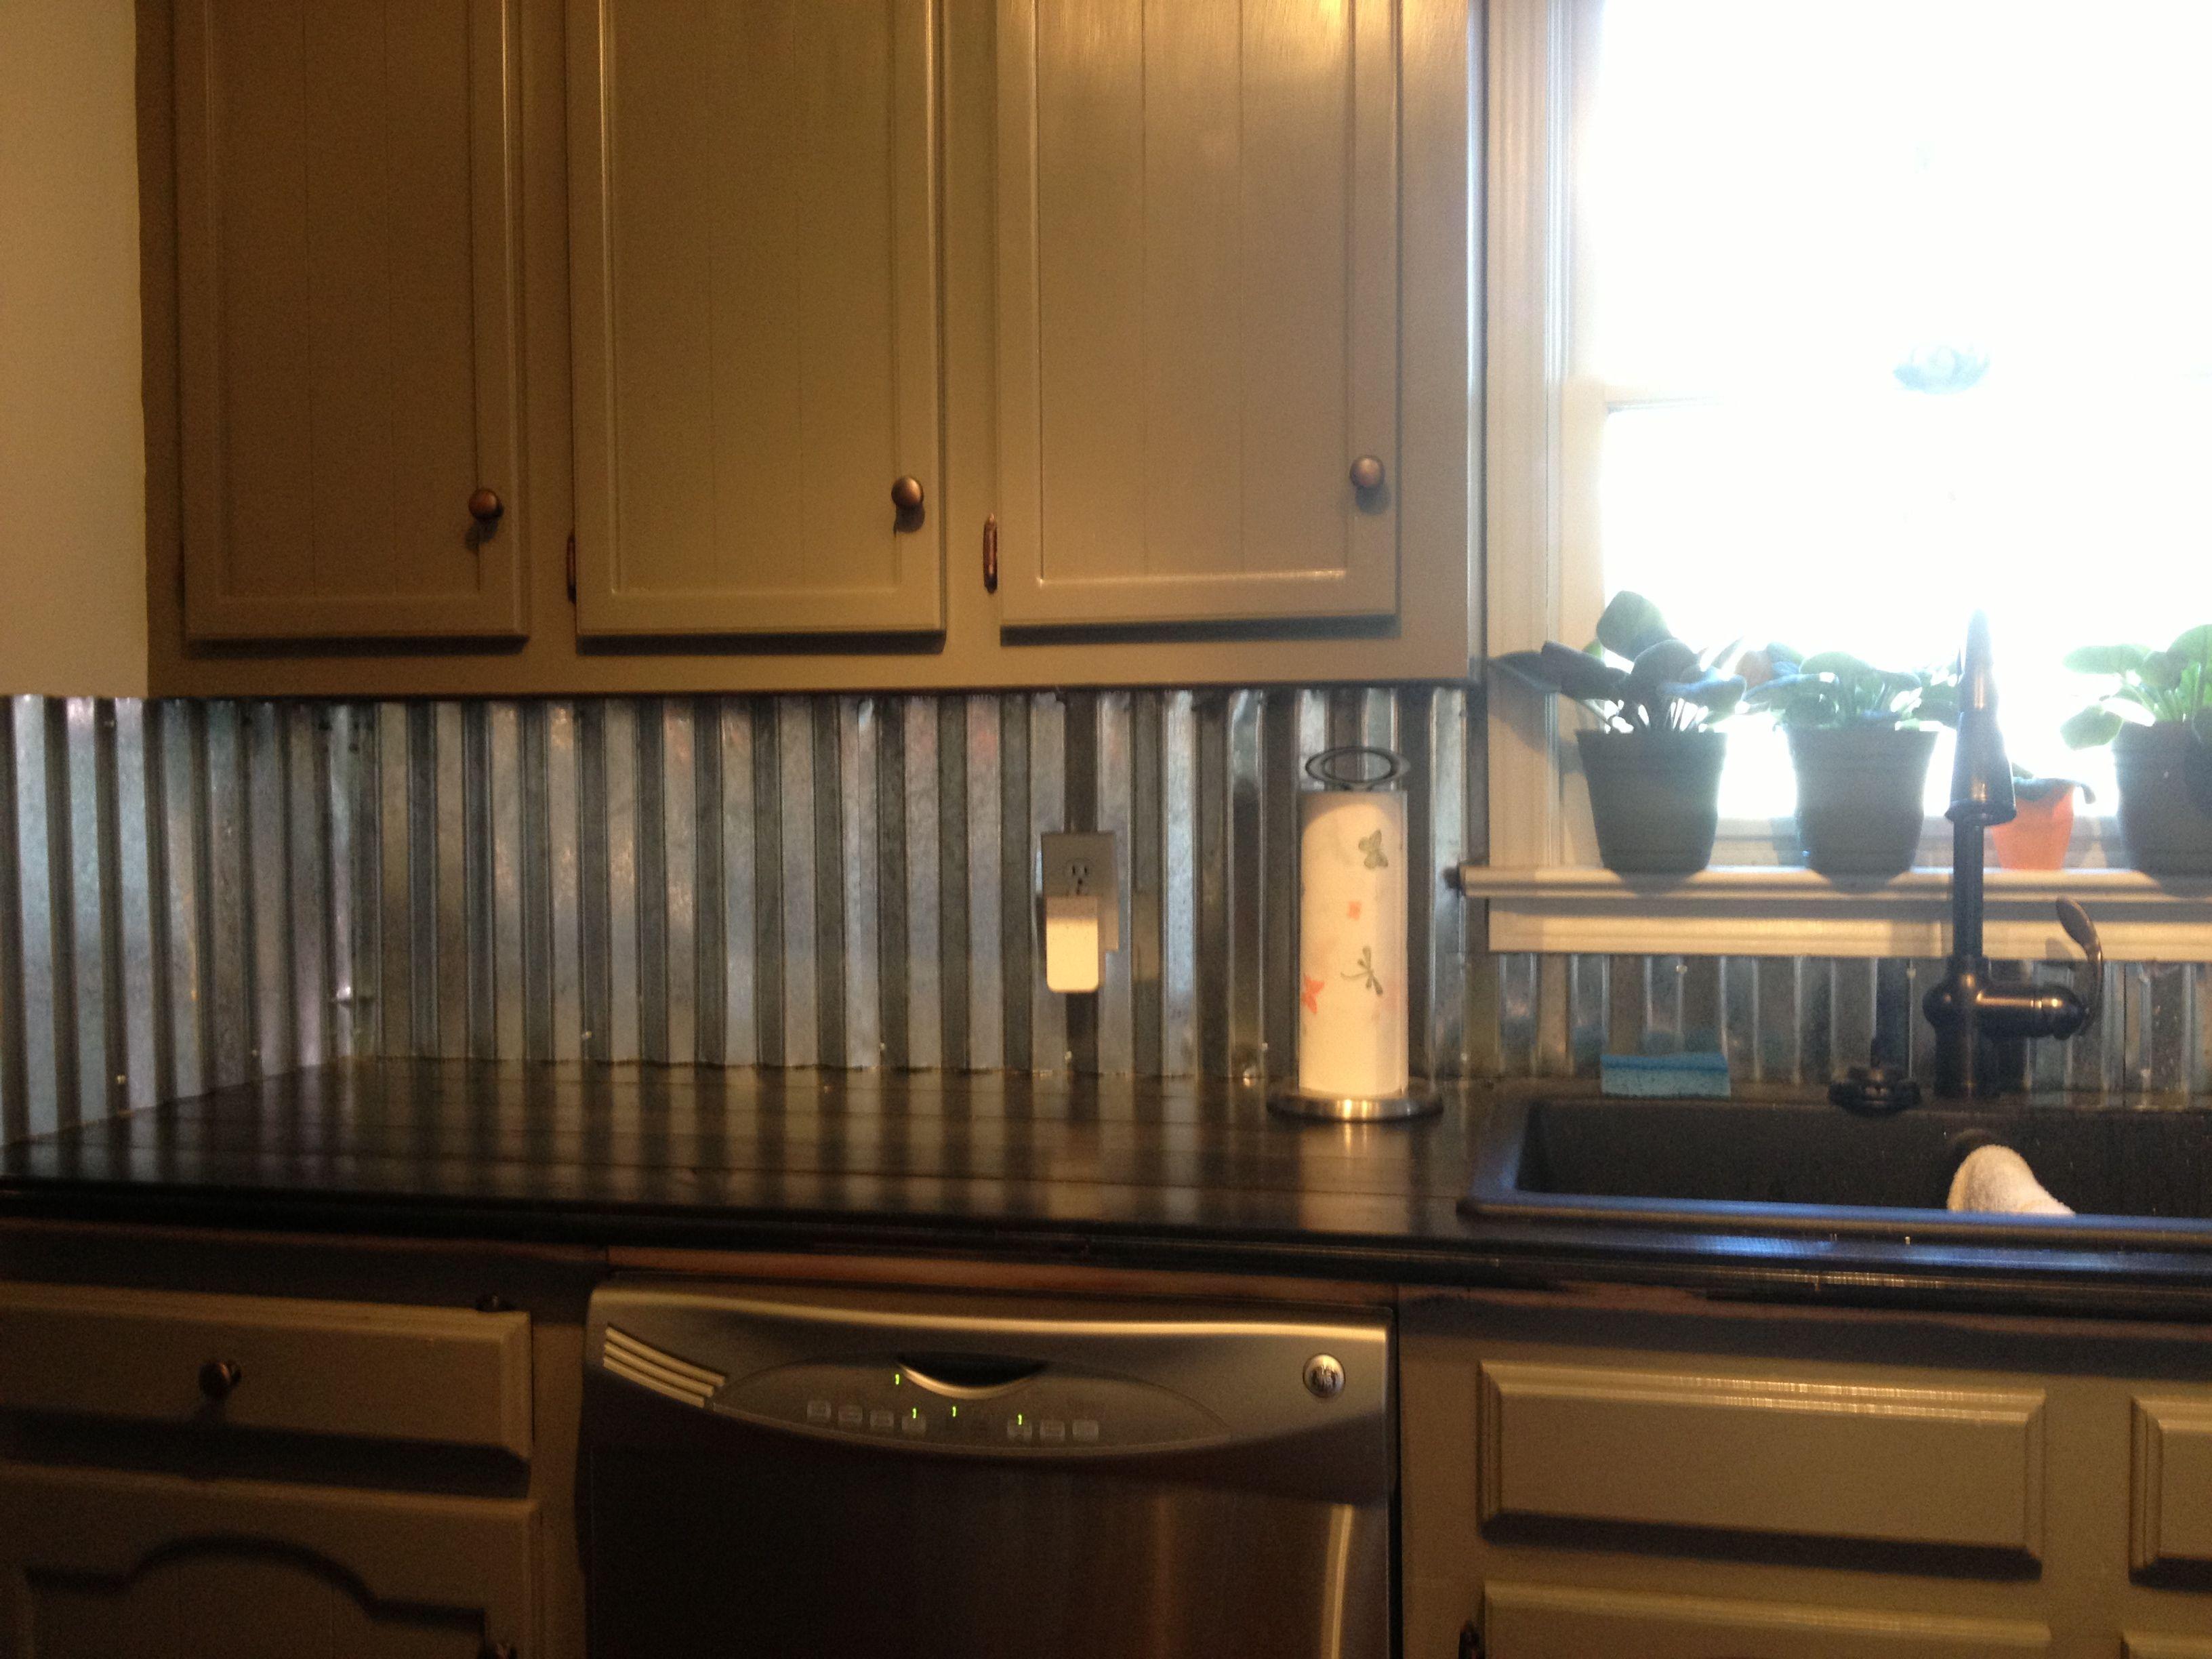 Corrugated Metal Backsplash Metal Backsplash Kitchen Tin Backsplash Kitchen Metallic Backsplash